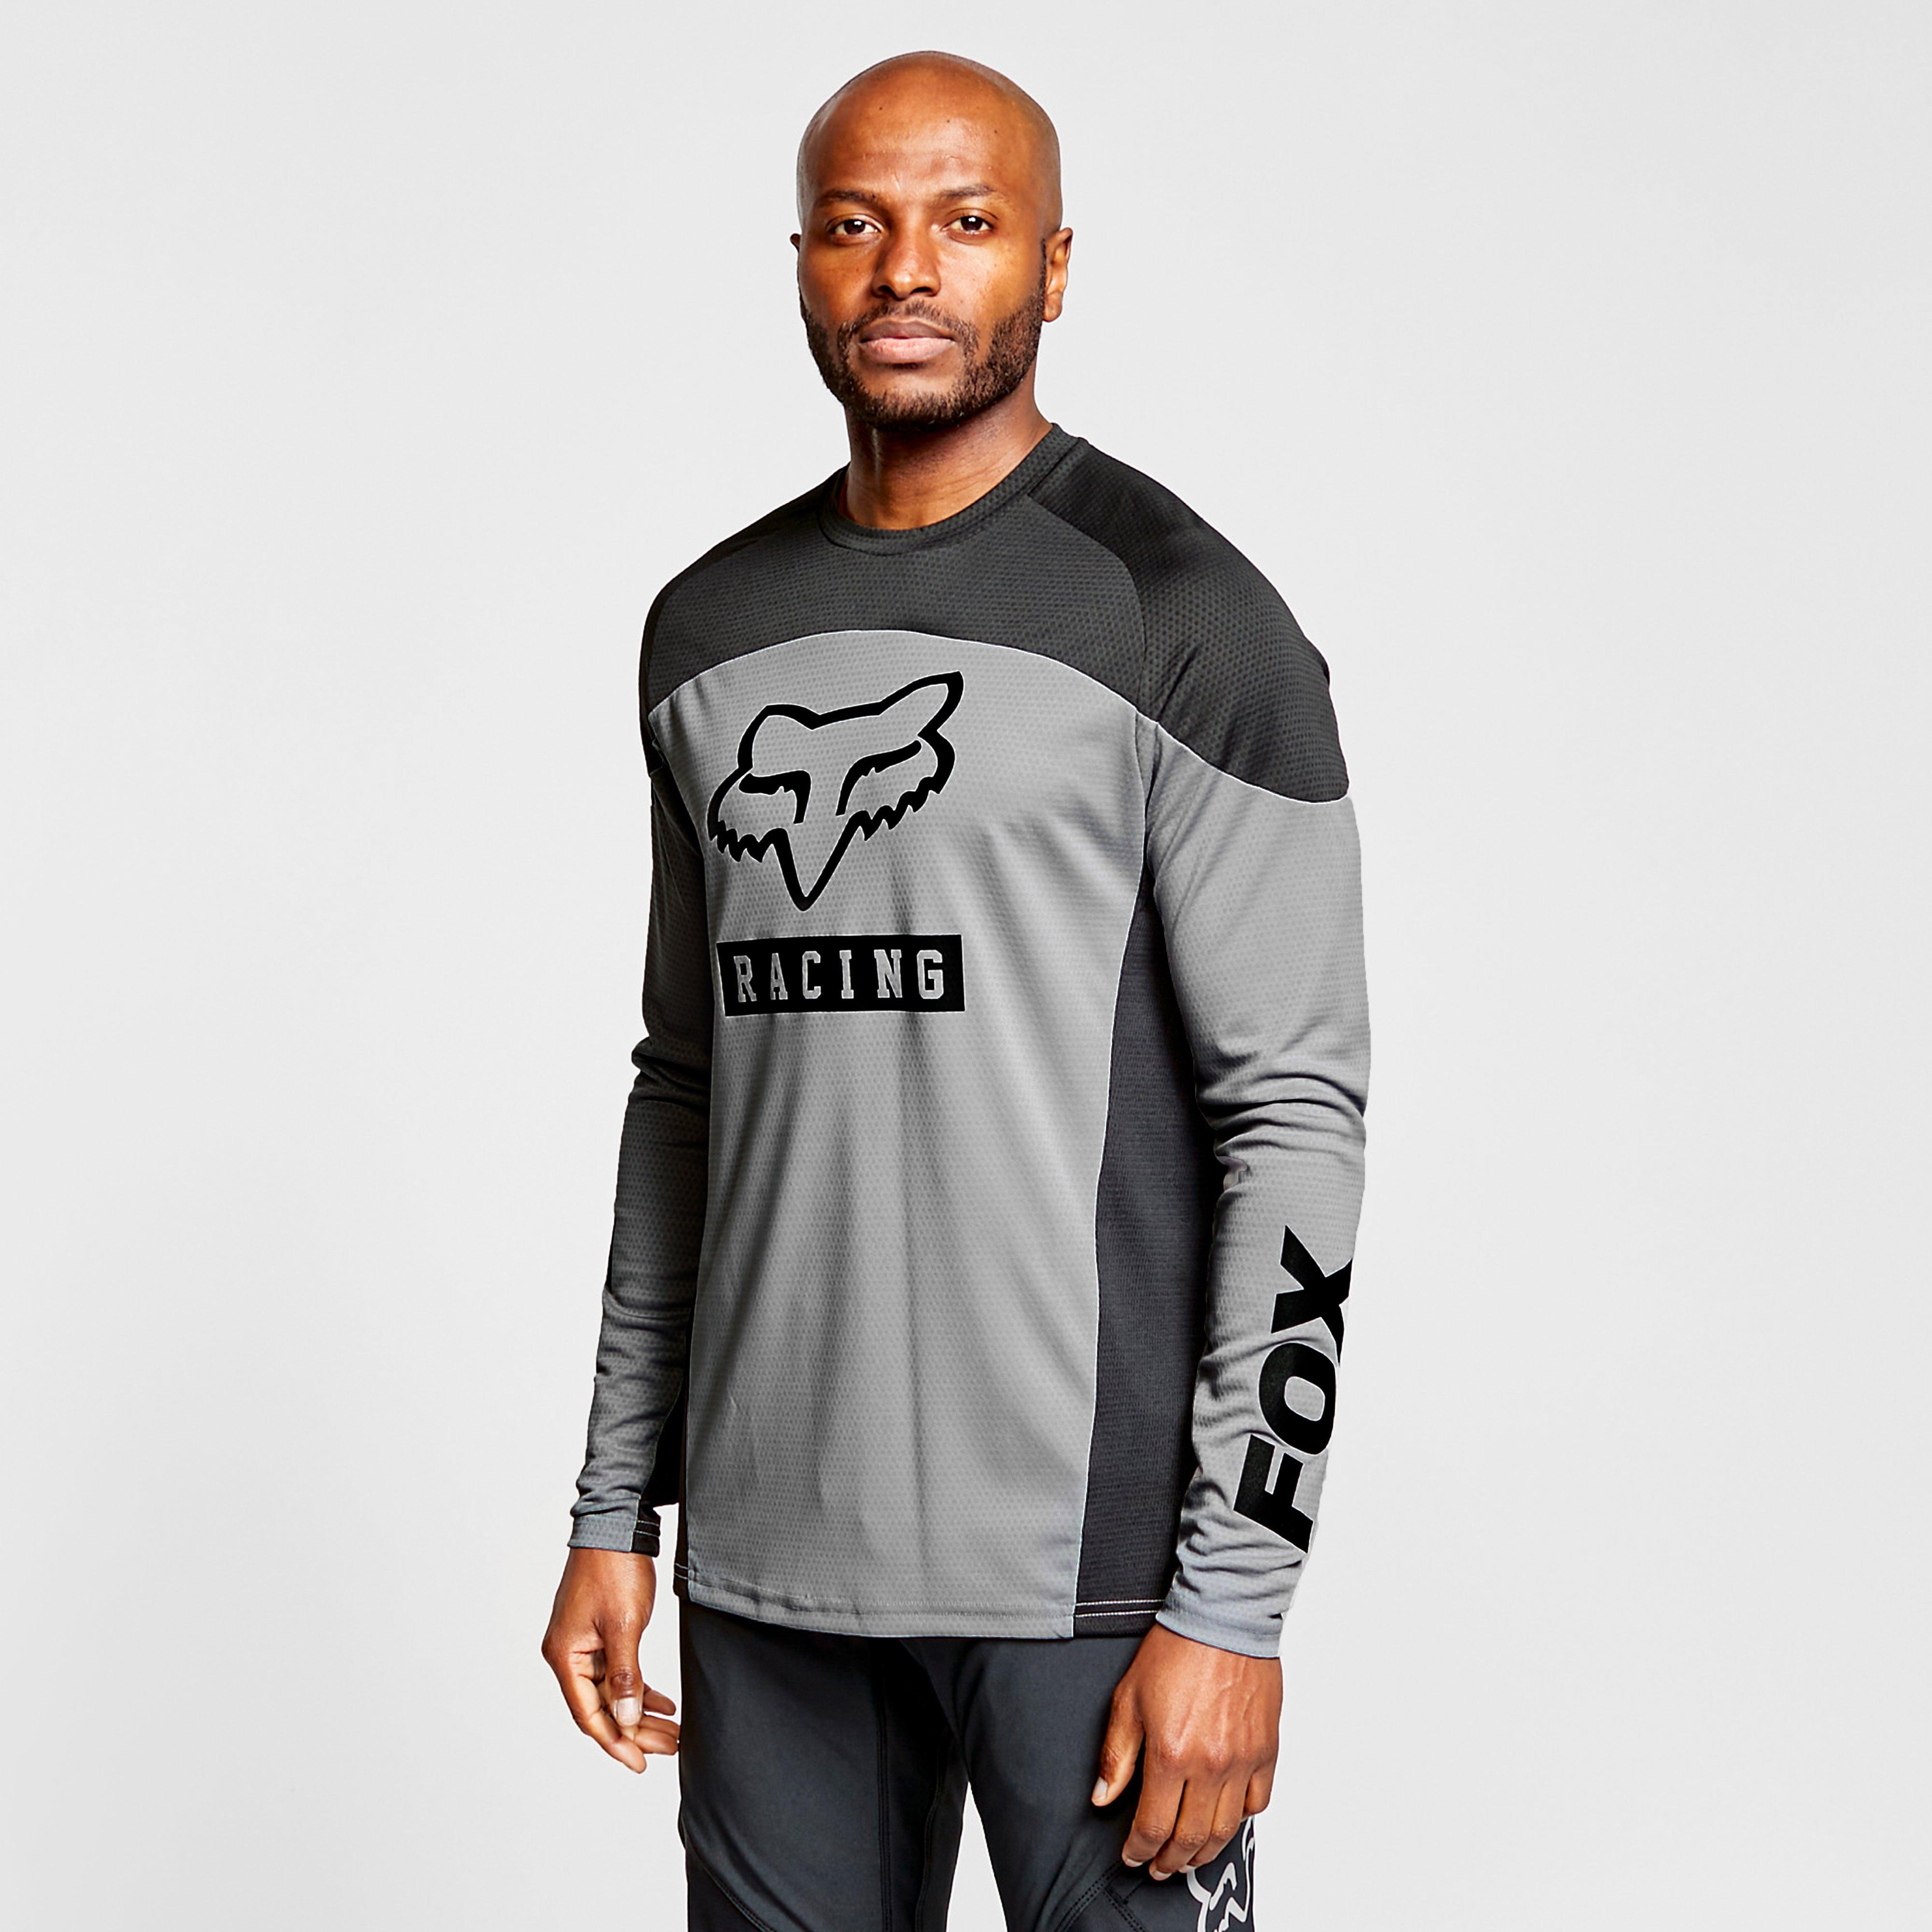 Fox Men's Defend Long-Sleeve Jersey - Grey/Black, Grey/Black